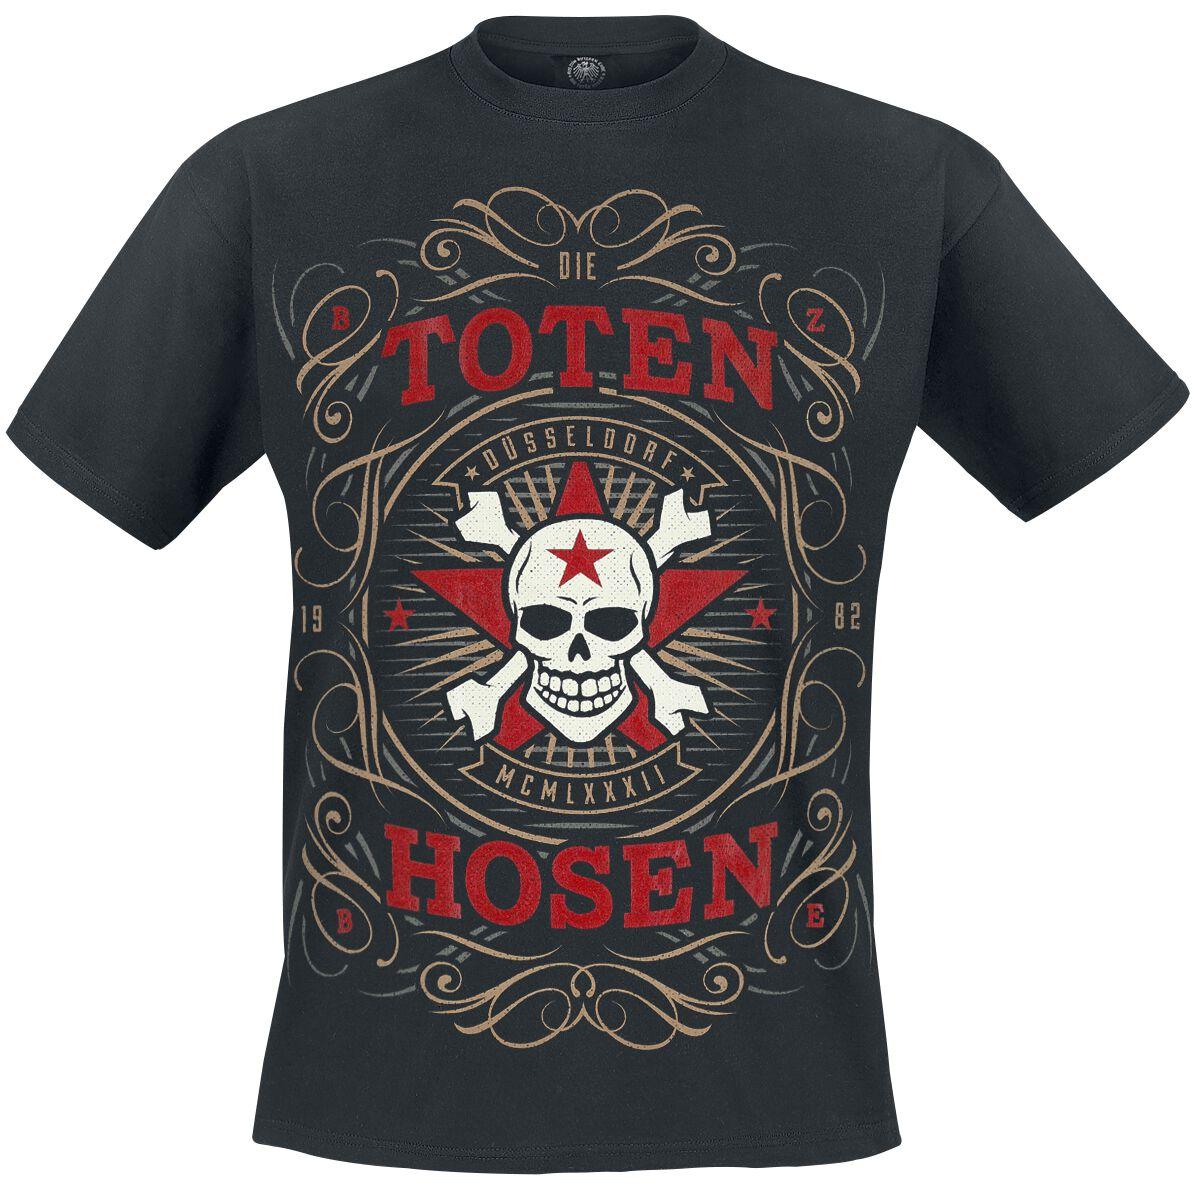 Image of   Die Toten Hosen Blumenkopf T-Shirt sort